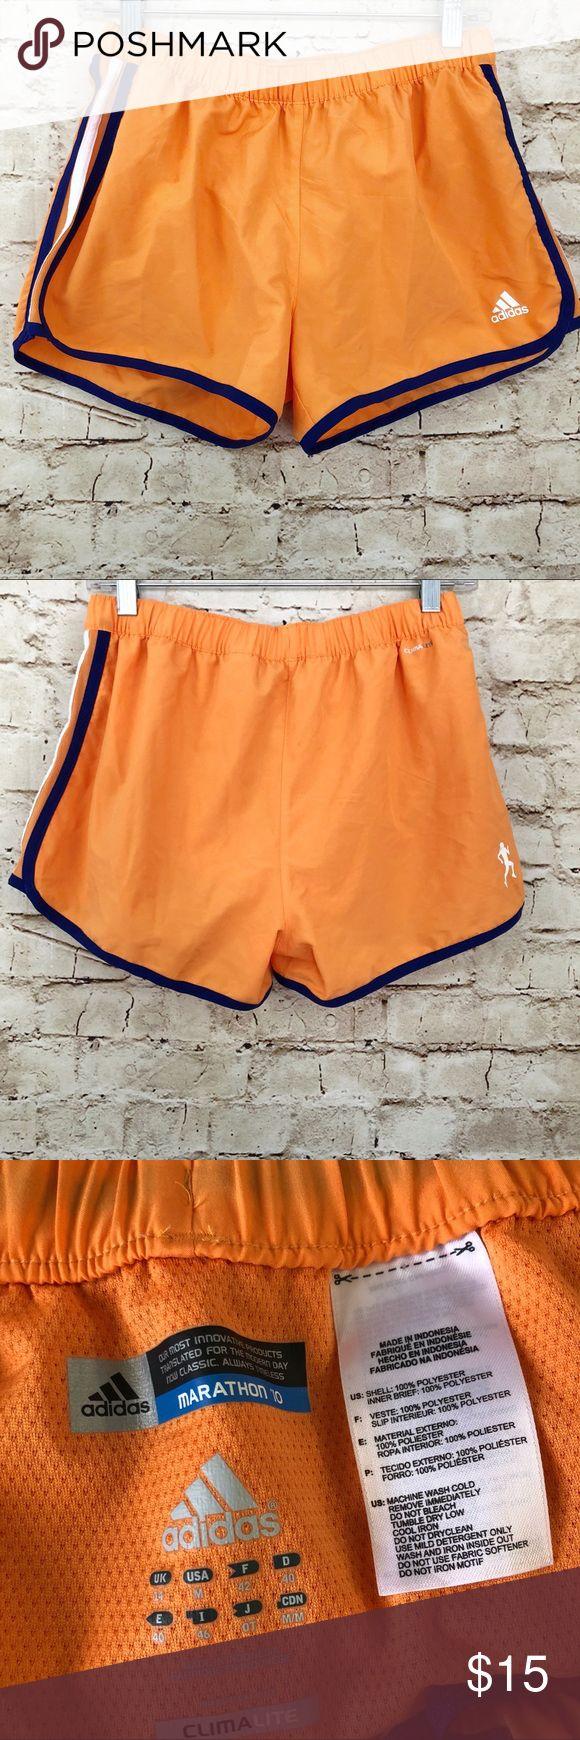 "Adidas marathon 10 running shorts climalite Adidas Marathon 10 climlite running shorts  Women's size medium  Orange navy & white  11"" long from waist  14"" waist flat lay (elastic stretch) adidas Shorts"